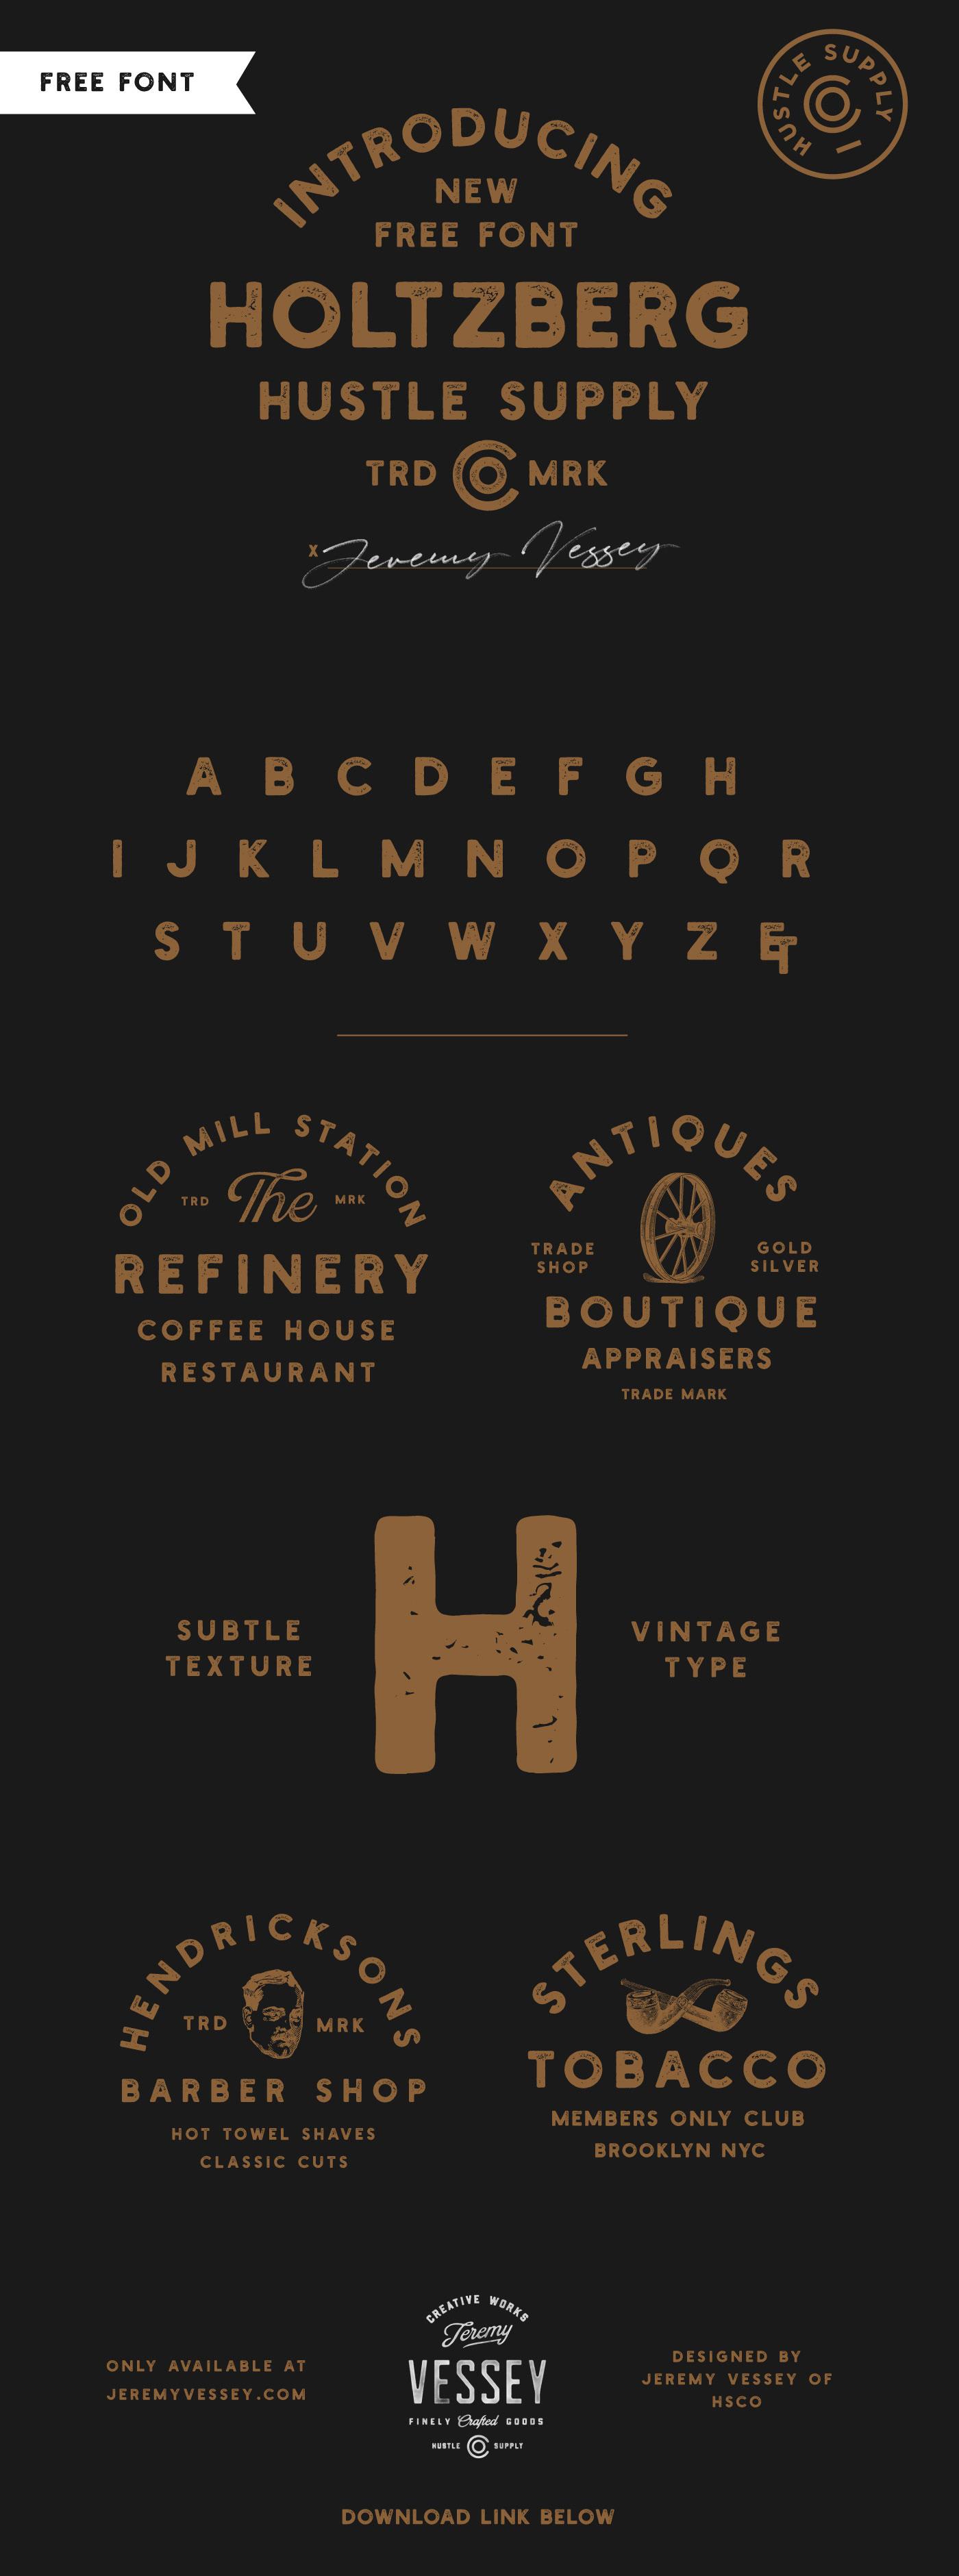 Free font free fonts vintage Typeface free freebie Retro texture typography   vintage logo